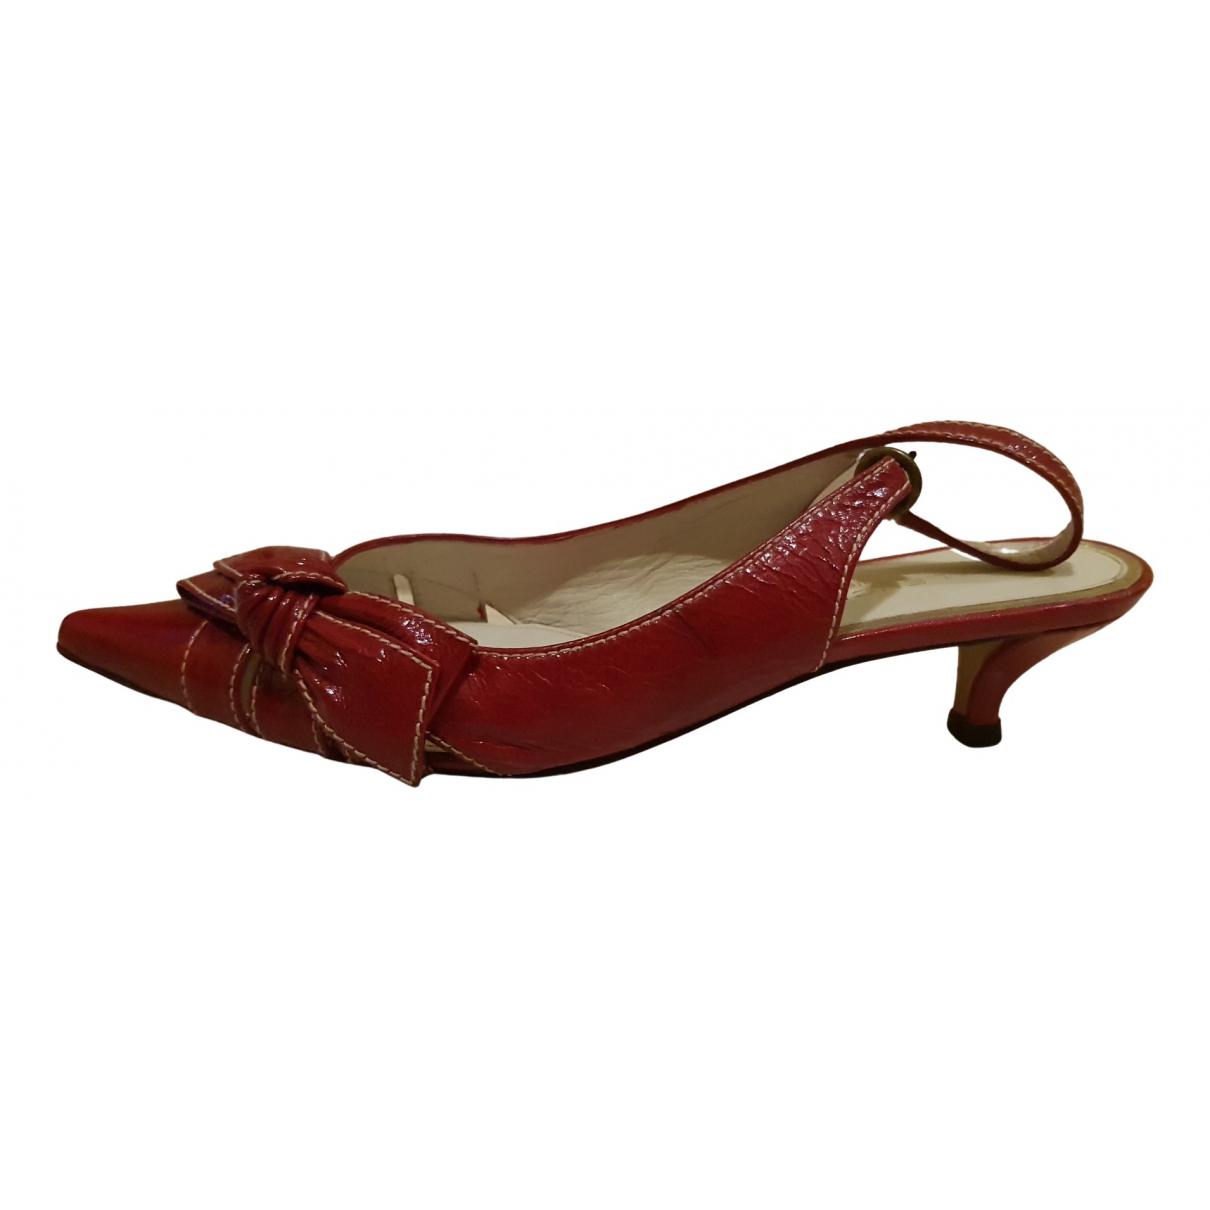 Balenciaga Knife Red Leather Sandals for Women 37 EU